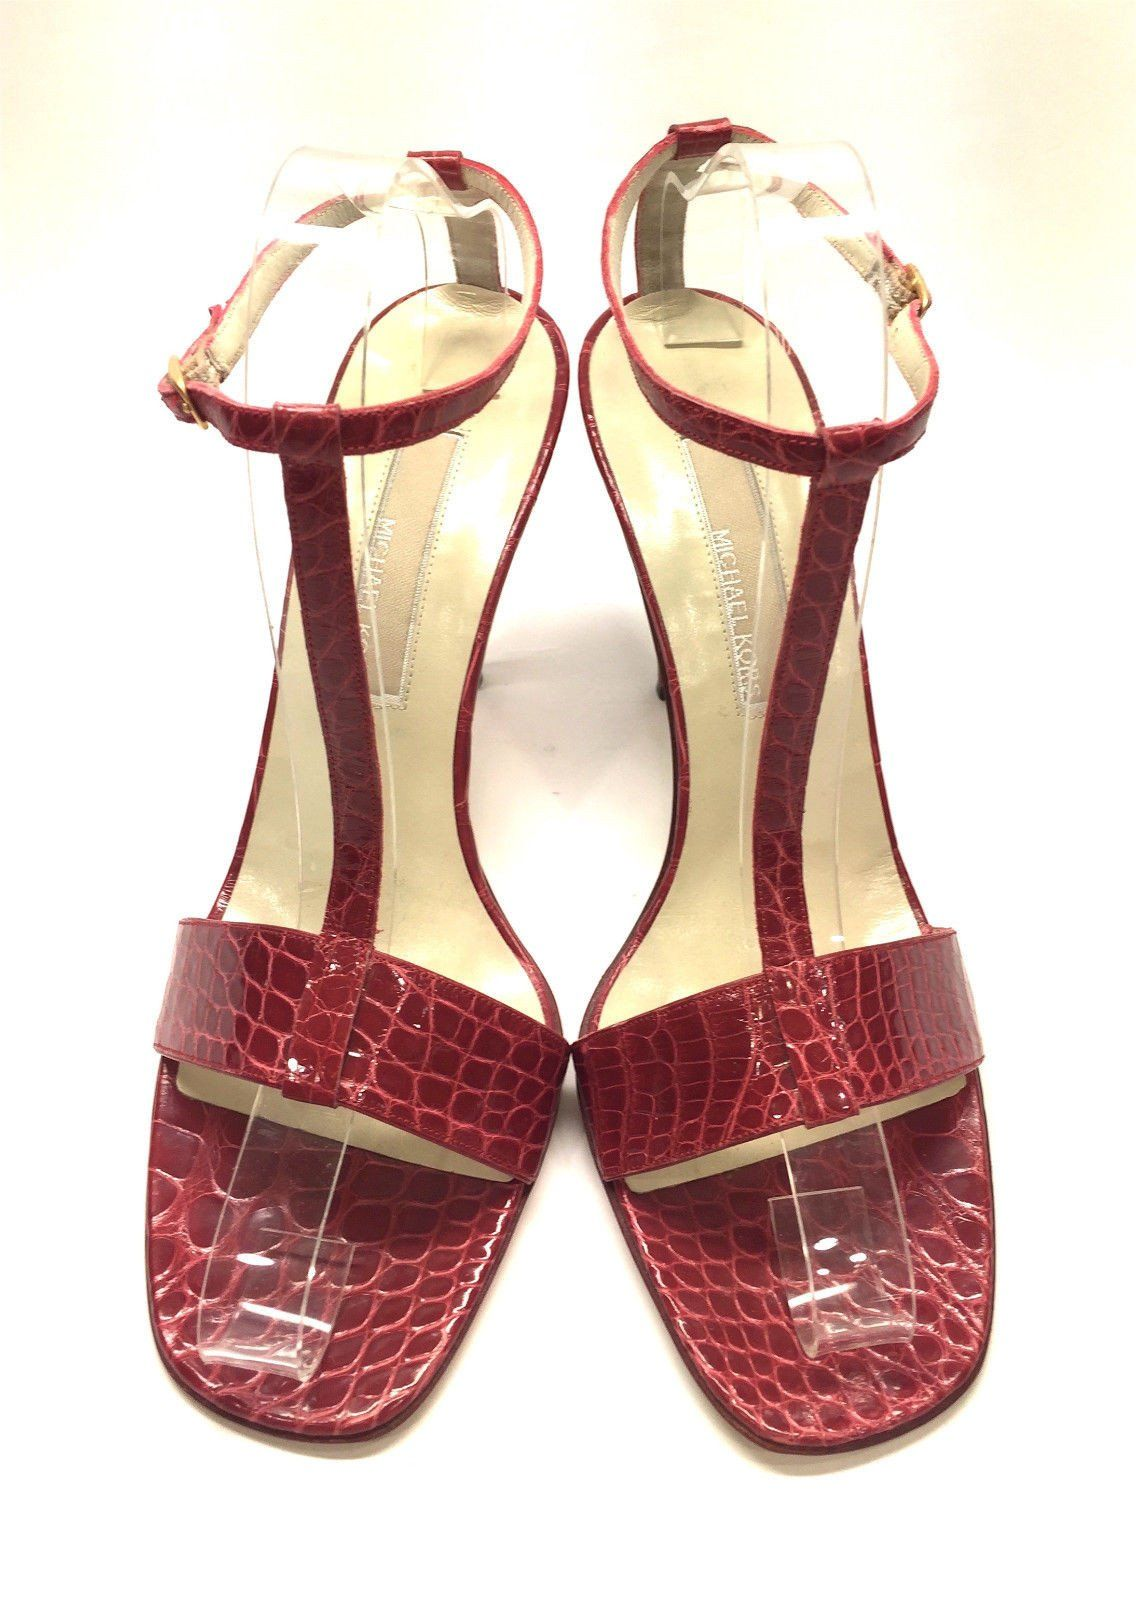 21bb721ebe66 MICHAEL KORS Red Croc-Skin T-Strap Slingbacks Heel Sandals Size  9M ...